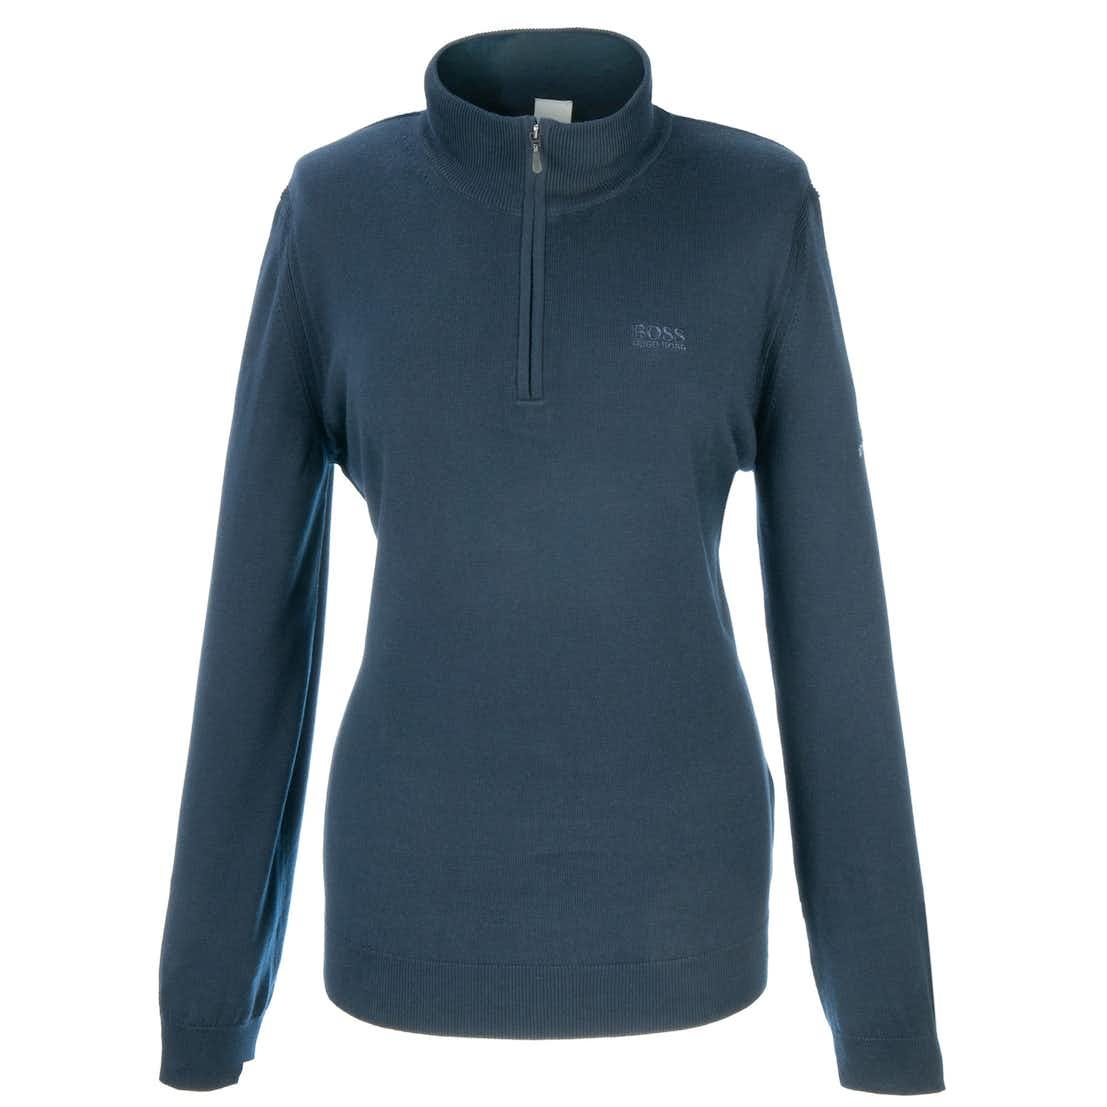 148th Royal Portrush BOSS 1/4-Zip Knitted Sweater - Blue